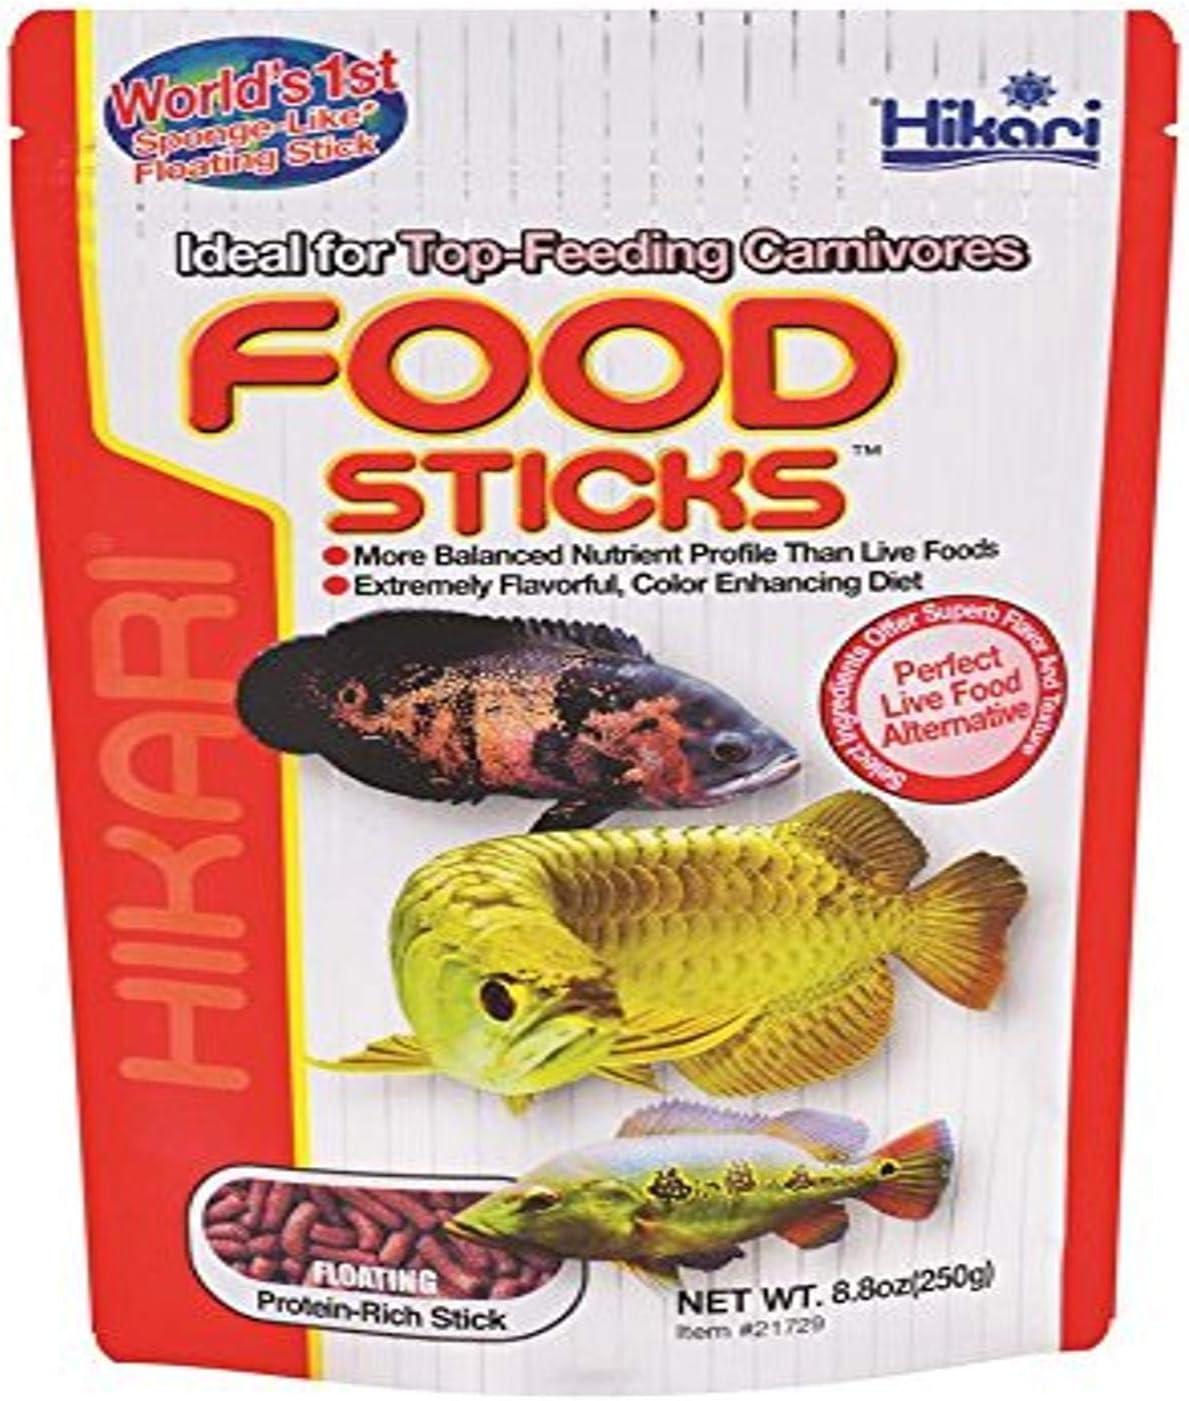 Hikari Floating Food Sticks for Pets, 8.8-Ounce